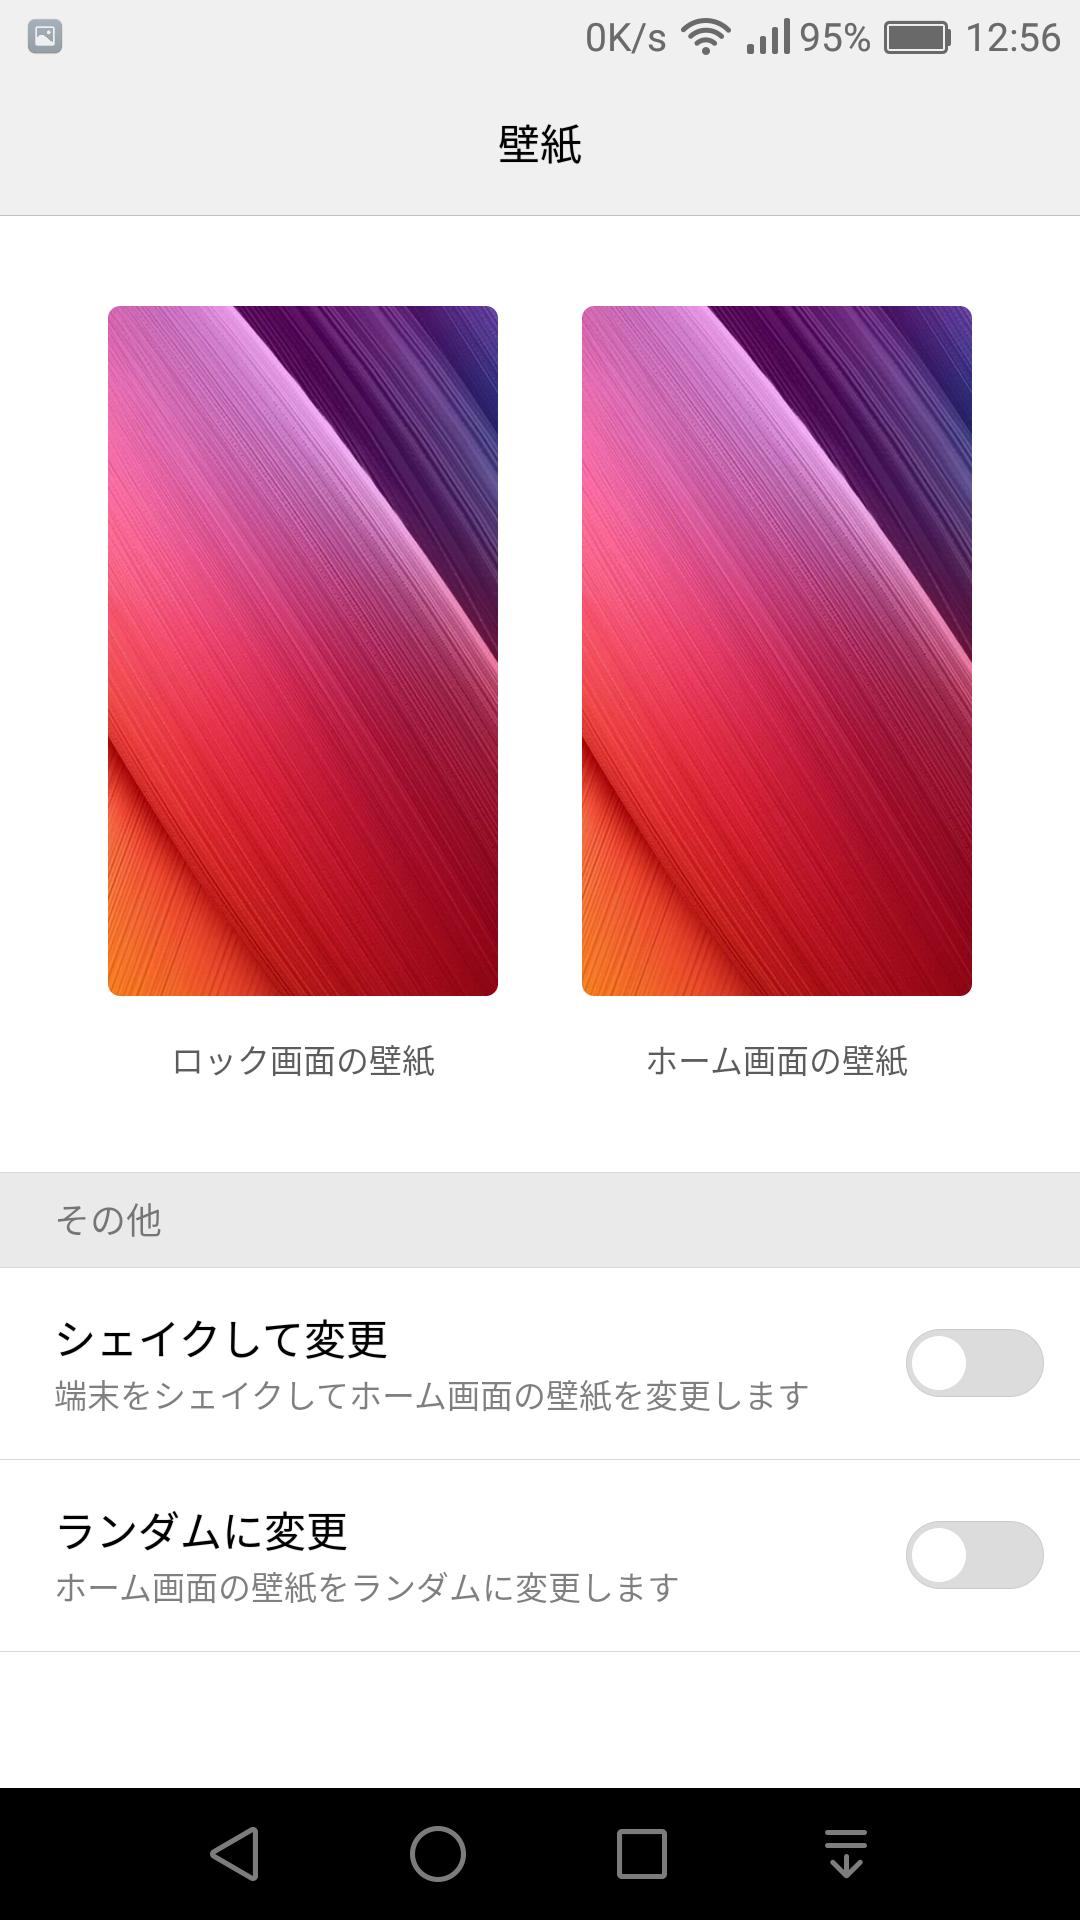 f:id:ukki0309:20170320183336p:plain